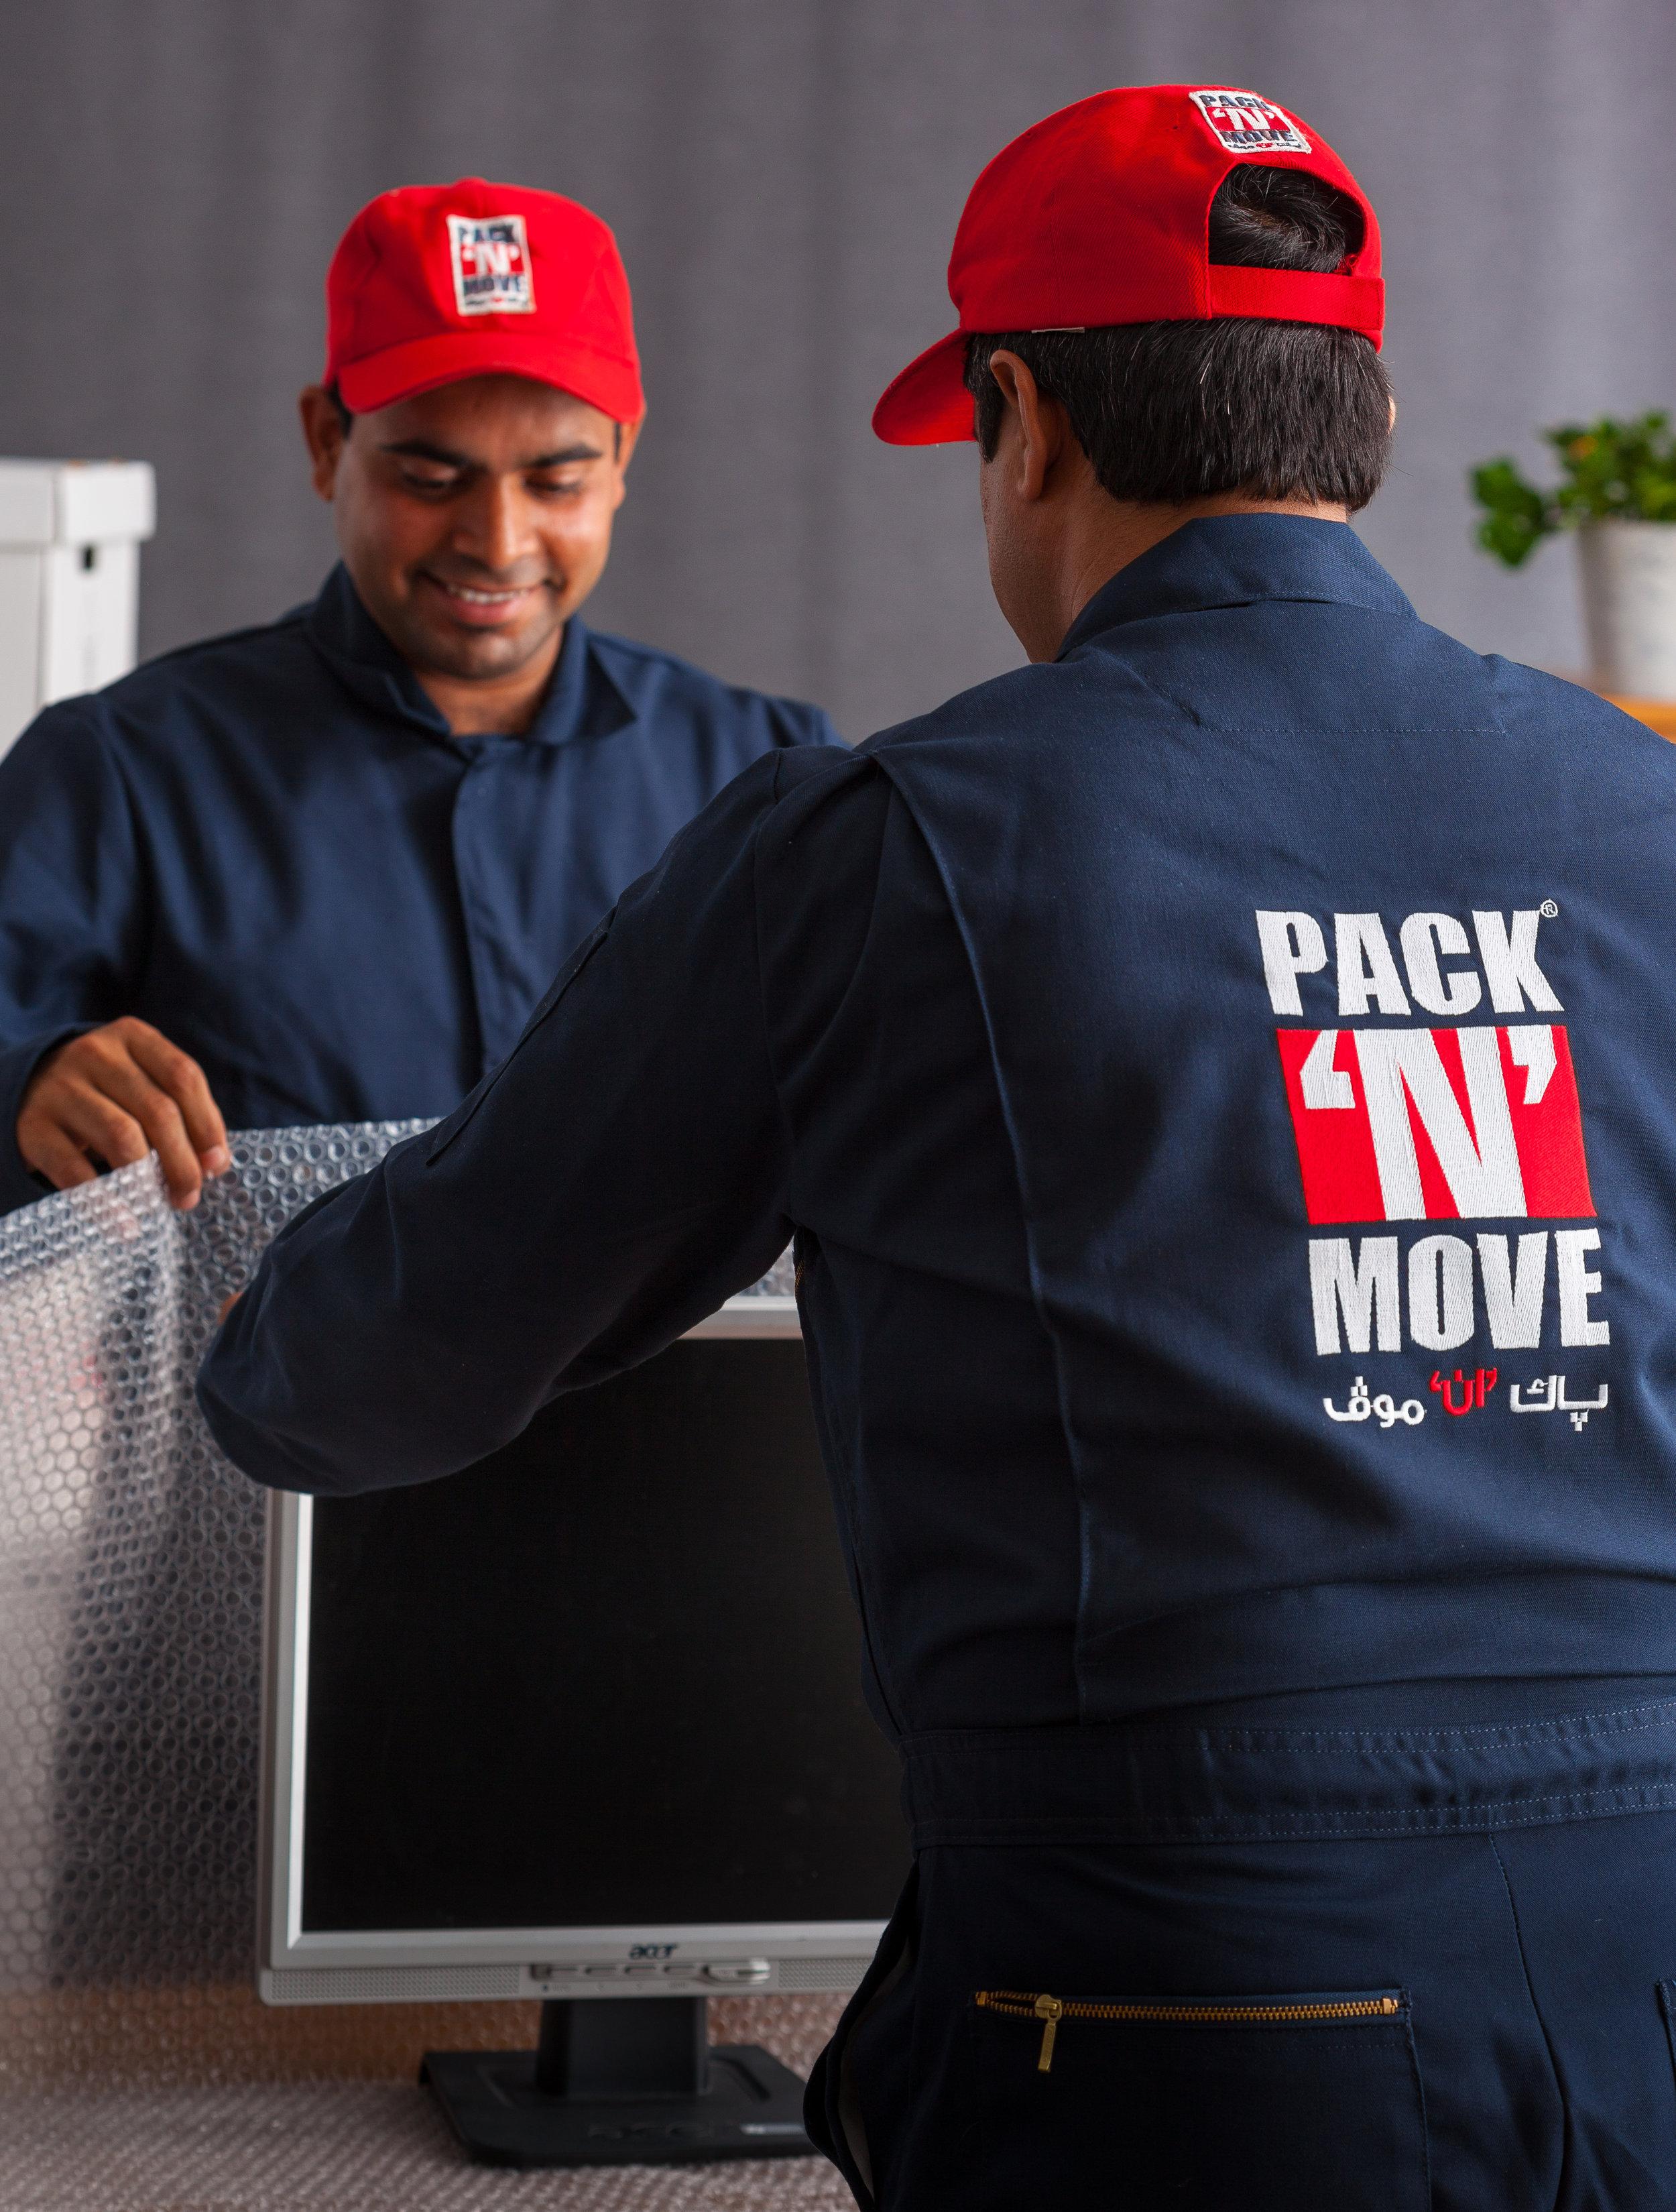 PackNMove-152.jpg